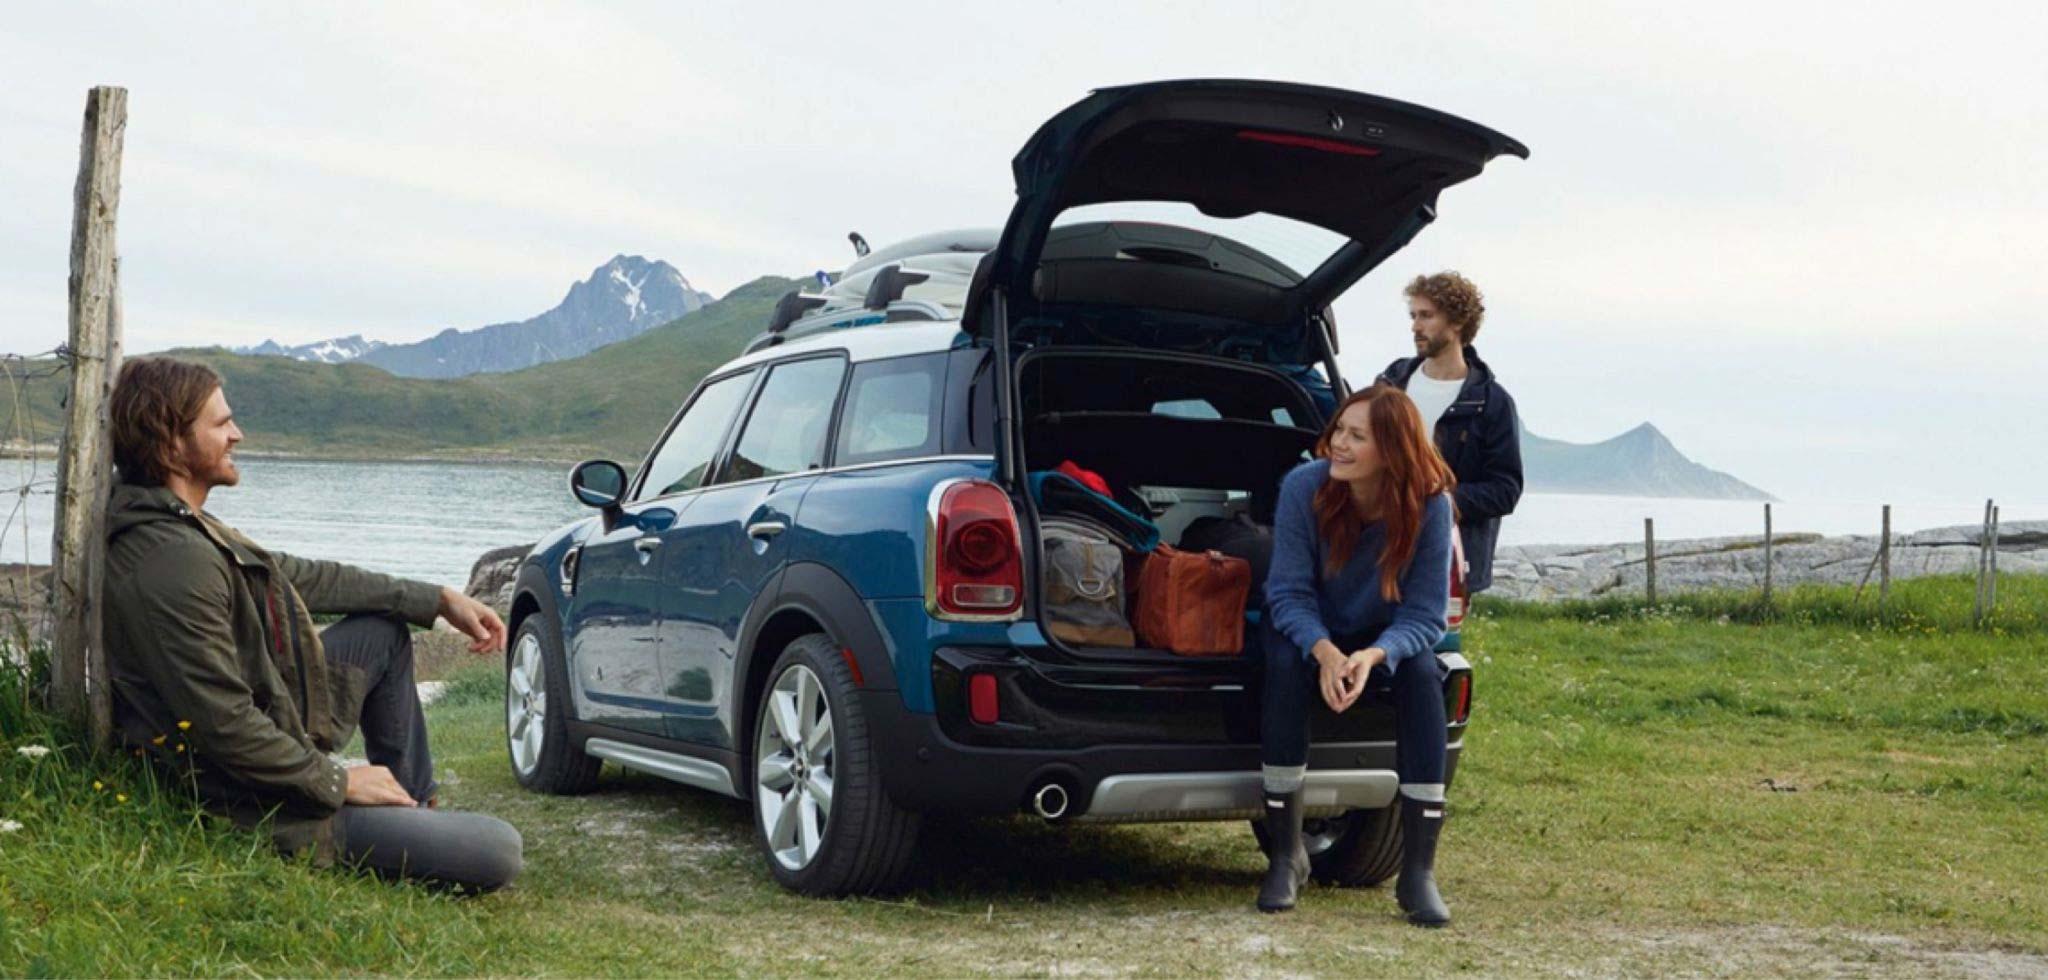 Fields Auto Group | New Volkswagen, Maserati, MINI, BMW